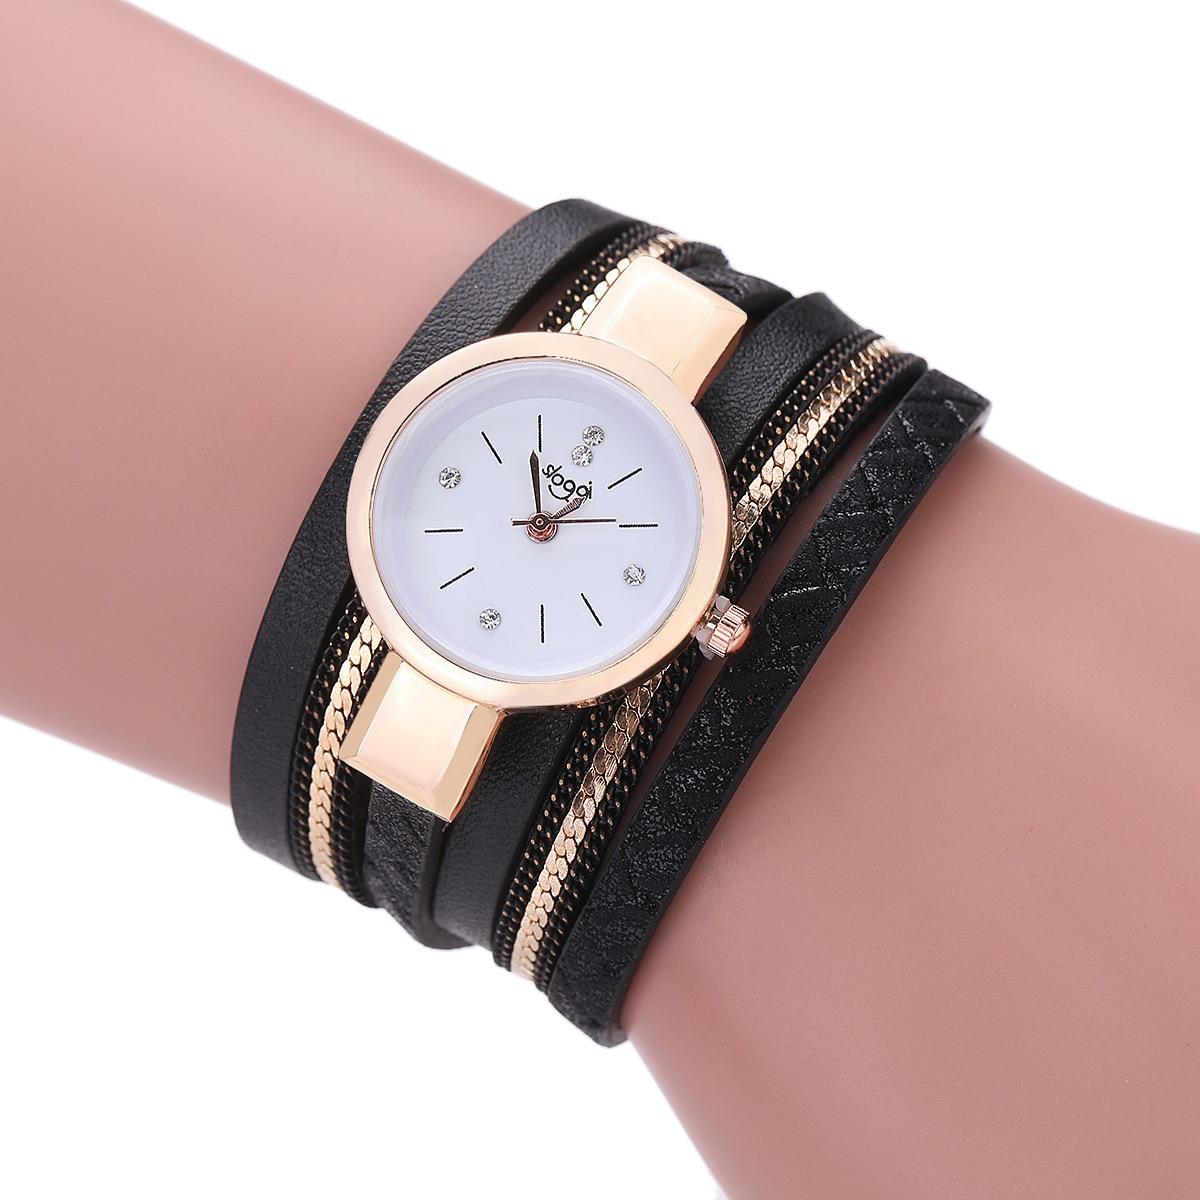 SLOGGI Brand Luxury Watches Women Fashion Gold Bracelet Watch Ladies Casual Leather Branded Quartz Wristwatches montre femme quartz wristwatches montre femme fashion casual creative watches women leather bracelet analog wrist clock watch 18jan25